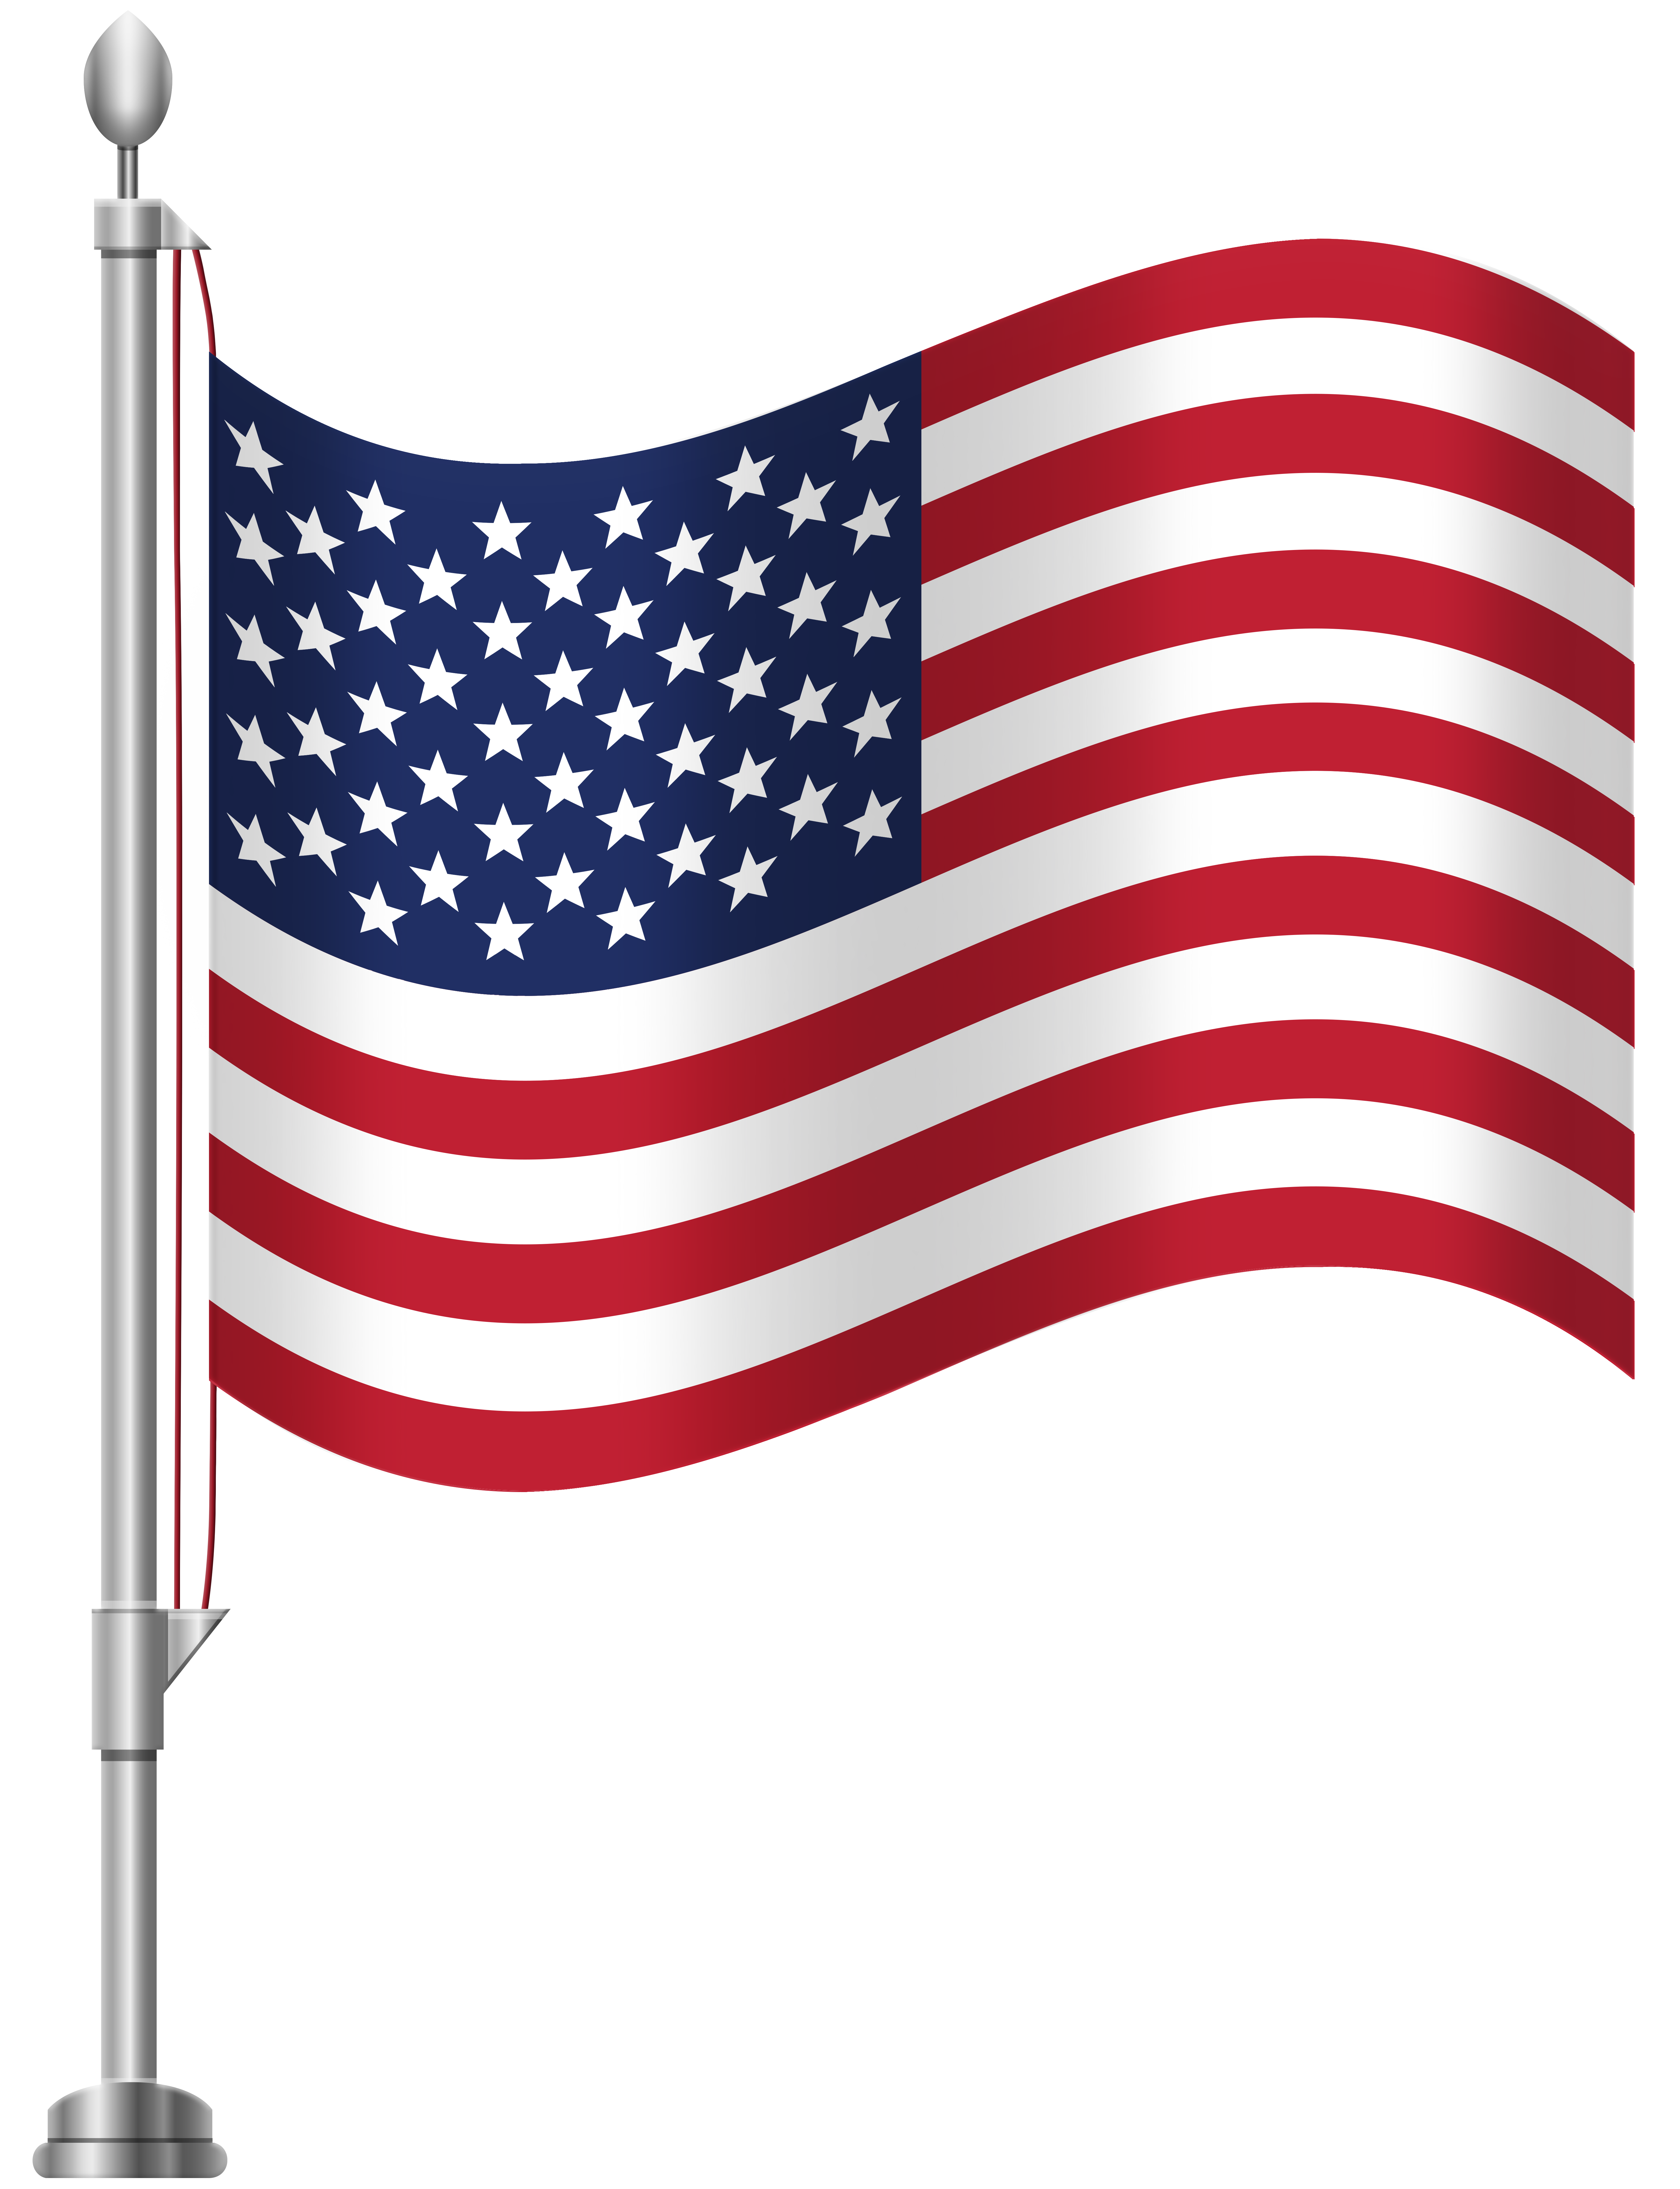 United States of America Clip Art